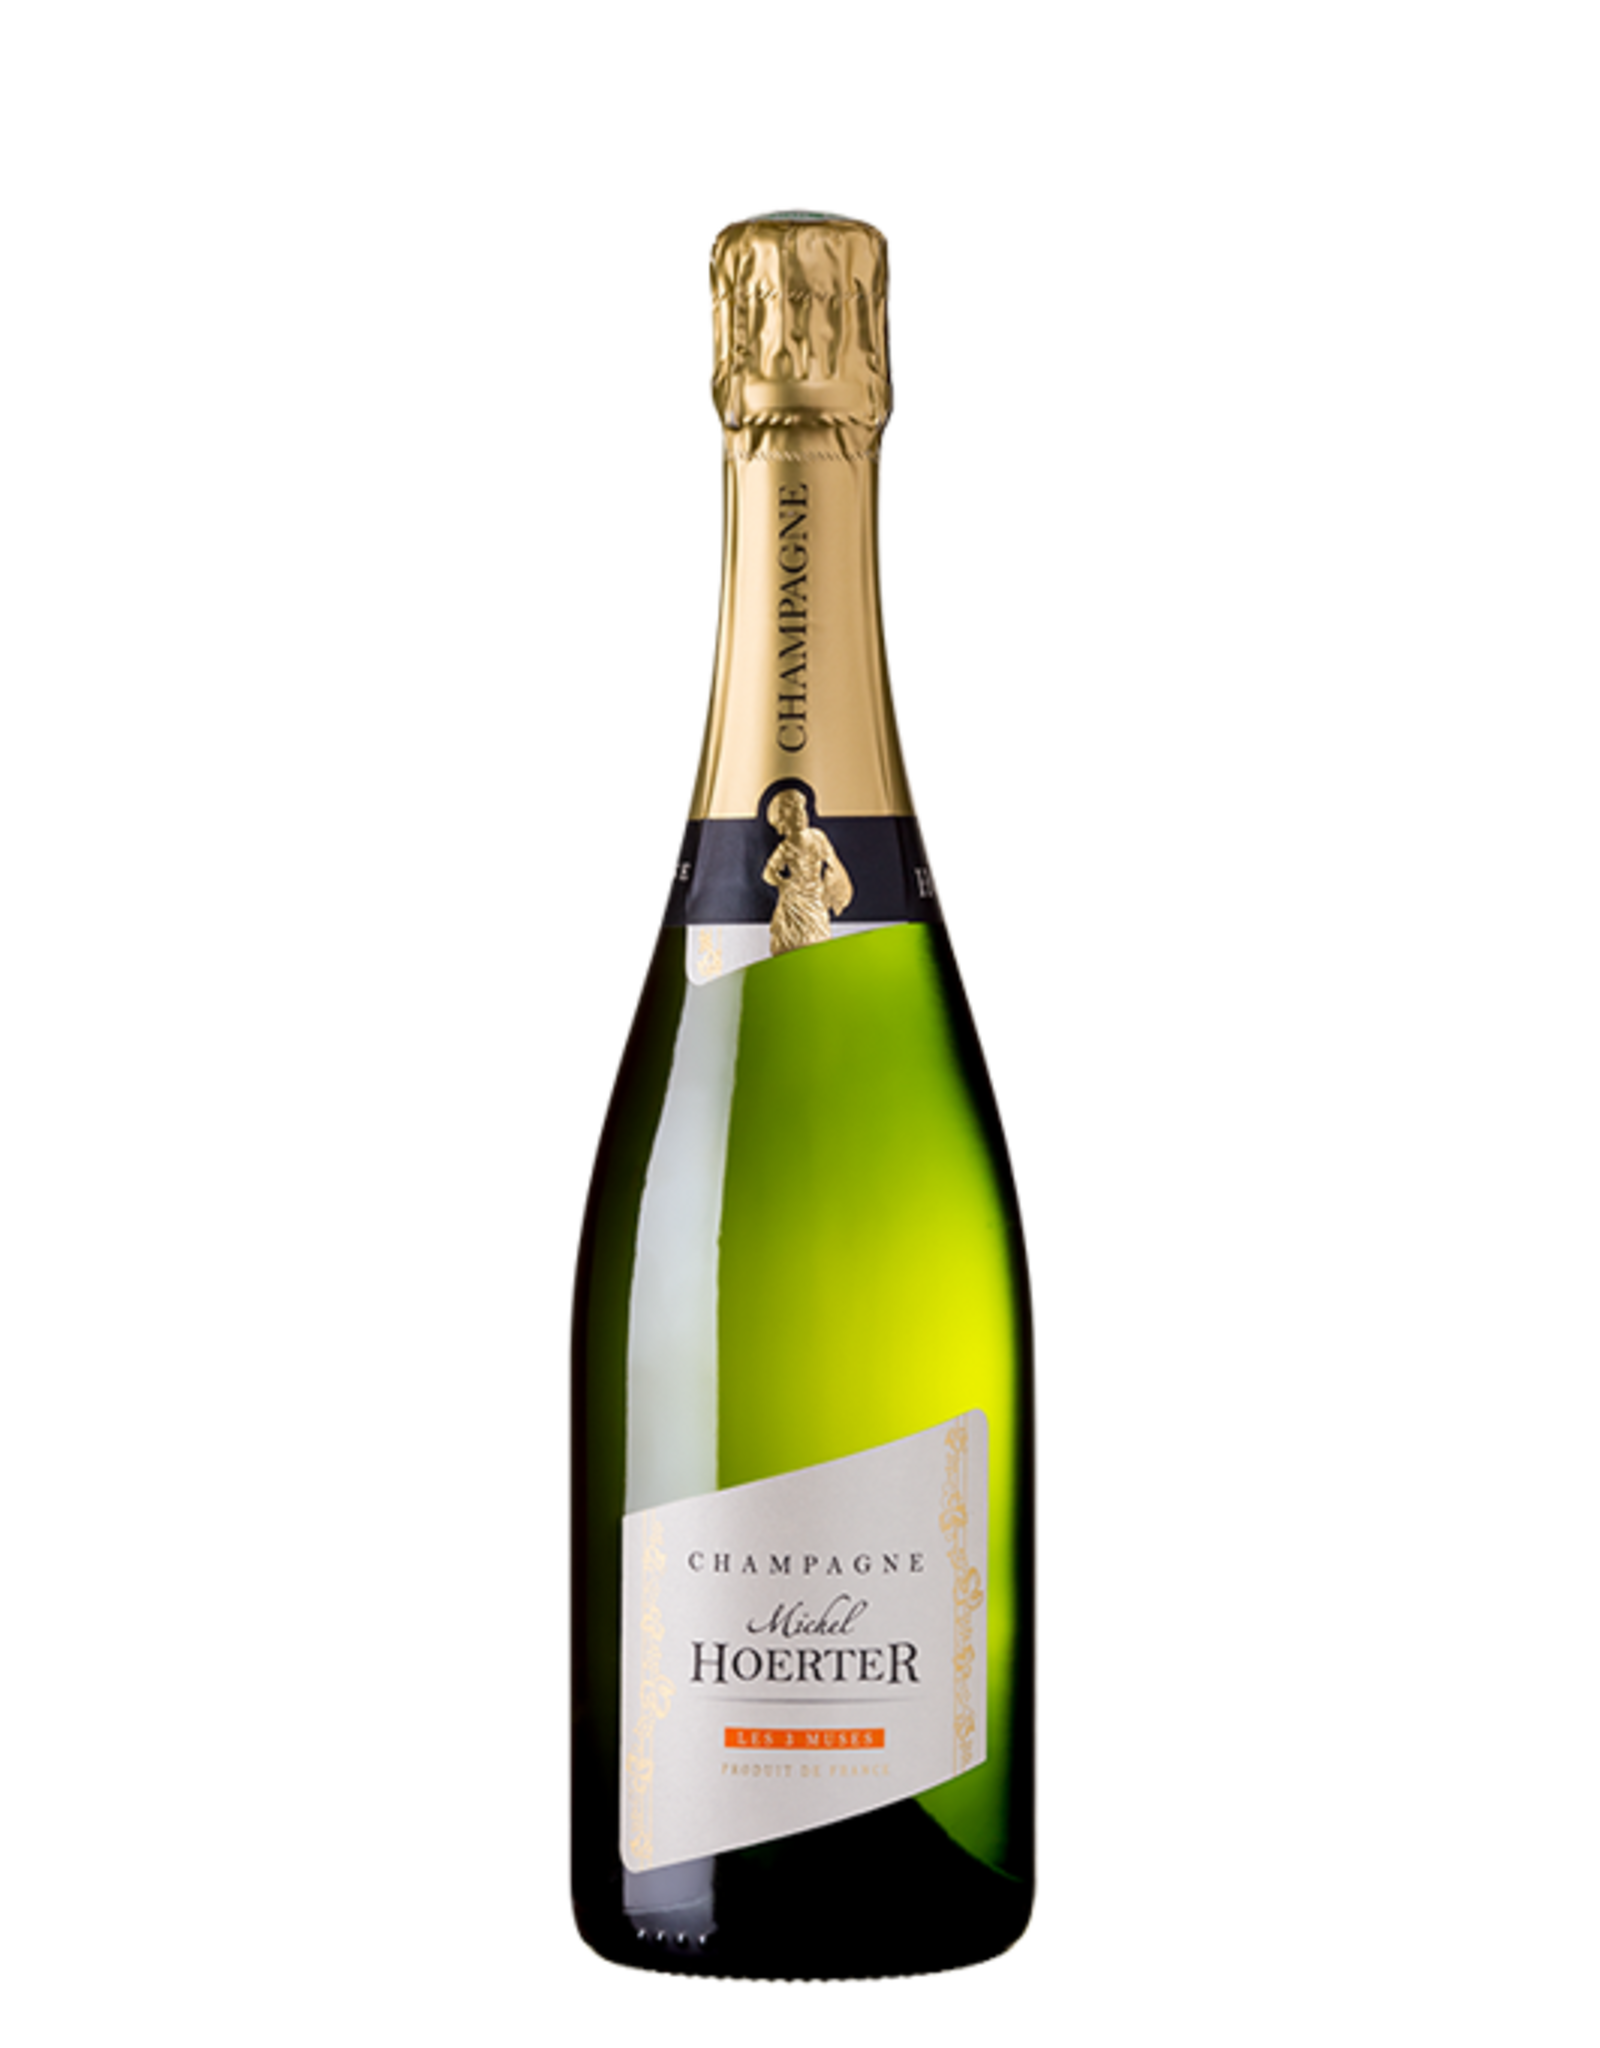 Michel Hoerter Champagne Michel Hoerter Les 3 Muses Brut